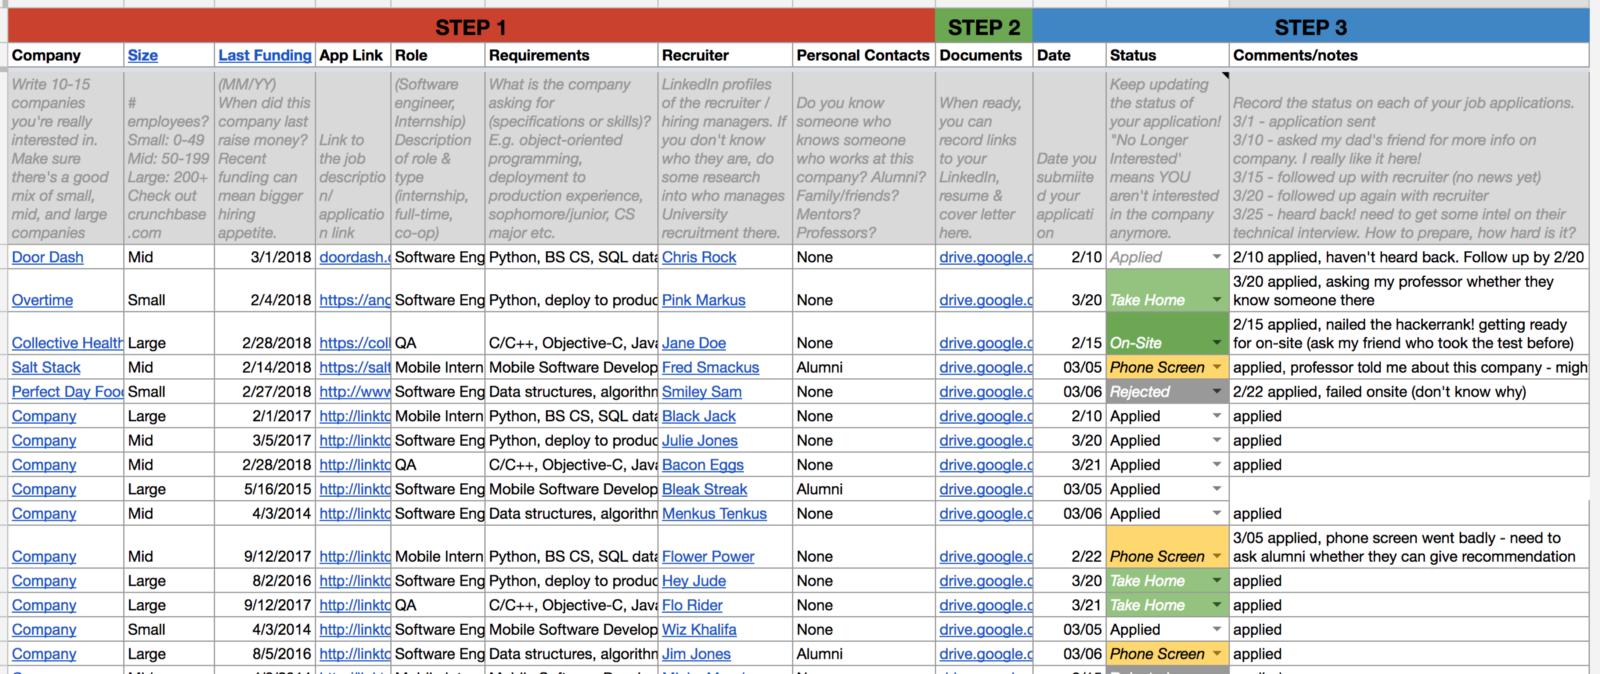 Job Application Tracker Spreadsheet Throughout Practical Guide To Navigate Your Internship Hunt – Codepath – Medium Job Application Tracker Spreadsheet Google Spreadshee Google Spreadshee job search tracker spreadsheet